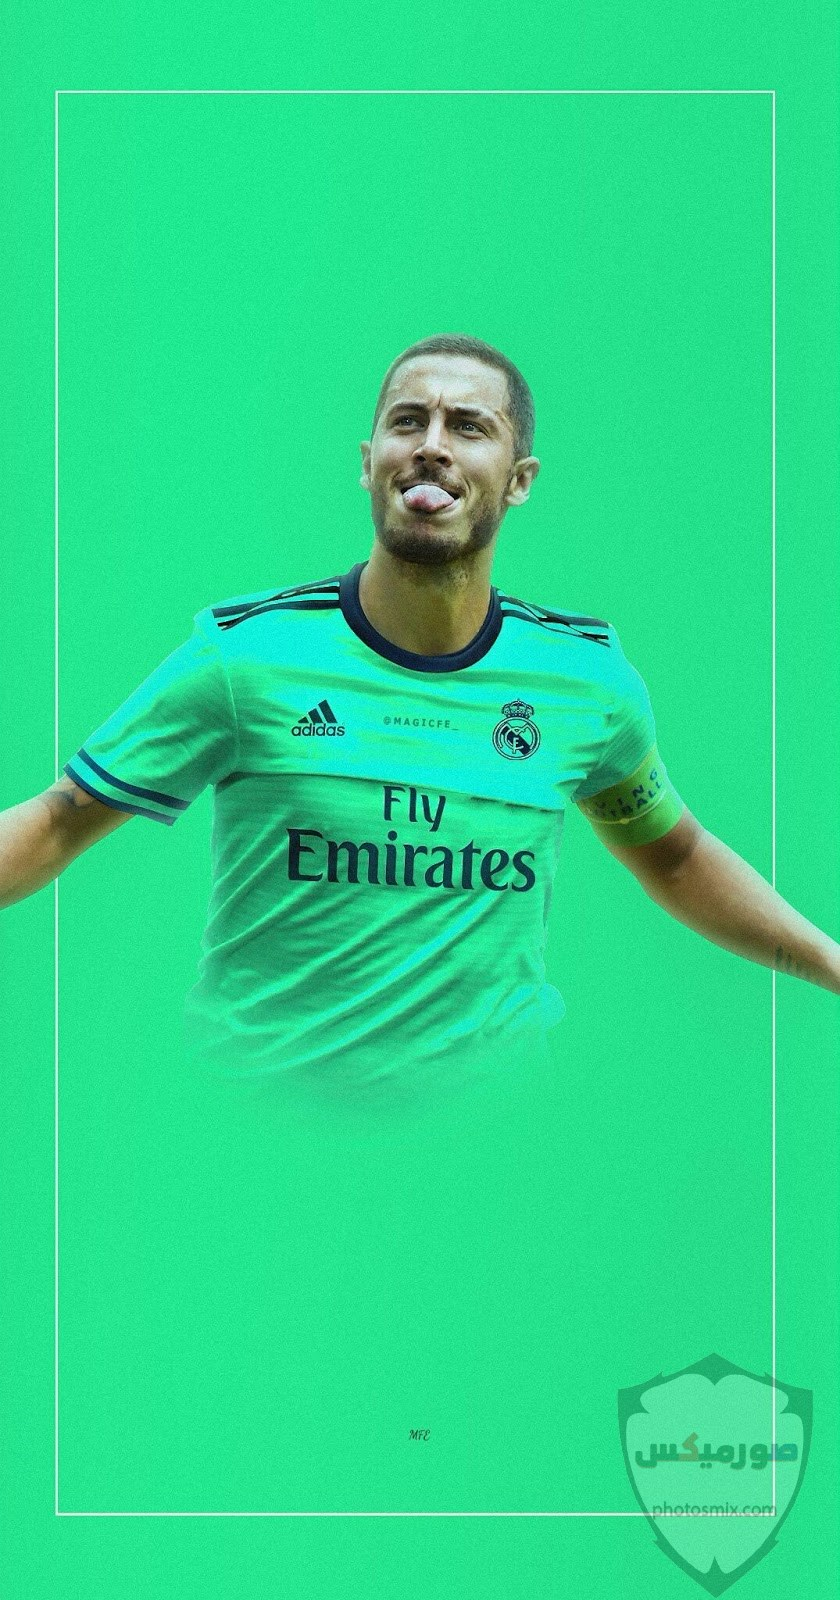 تصميم هازارد ريال مدريد 1